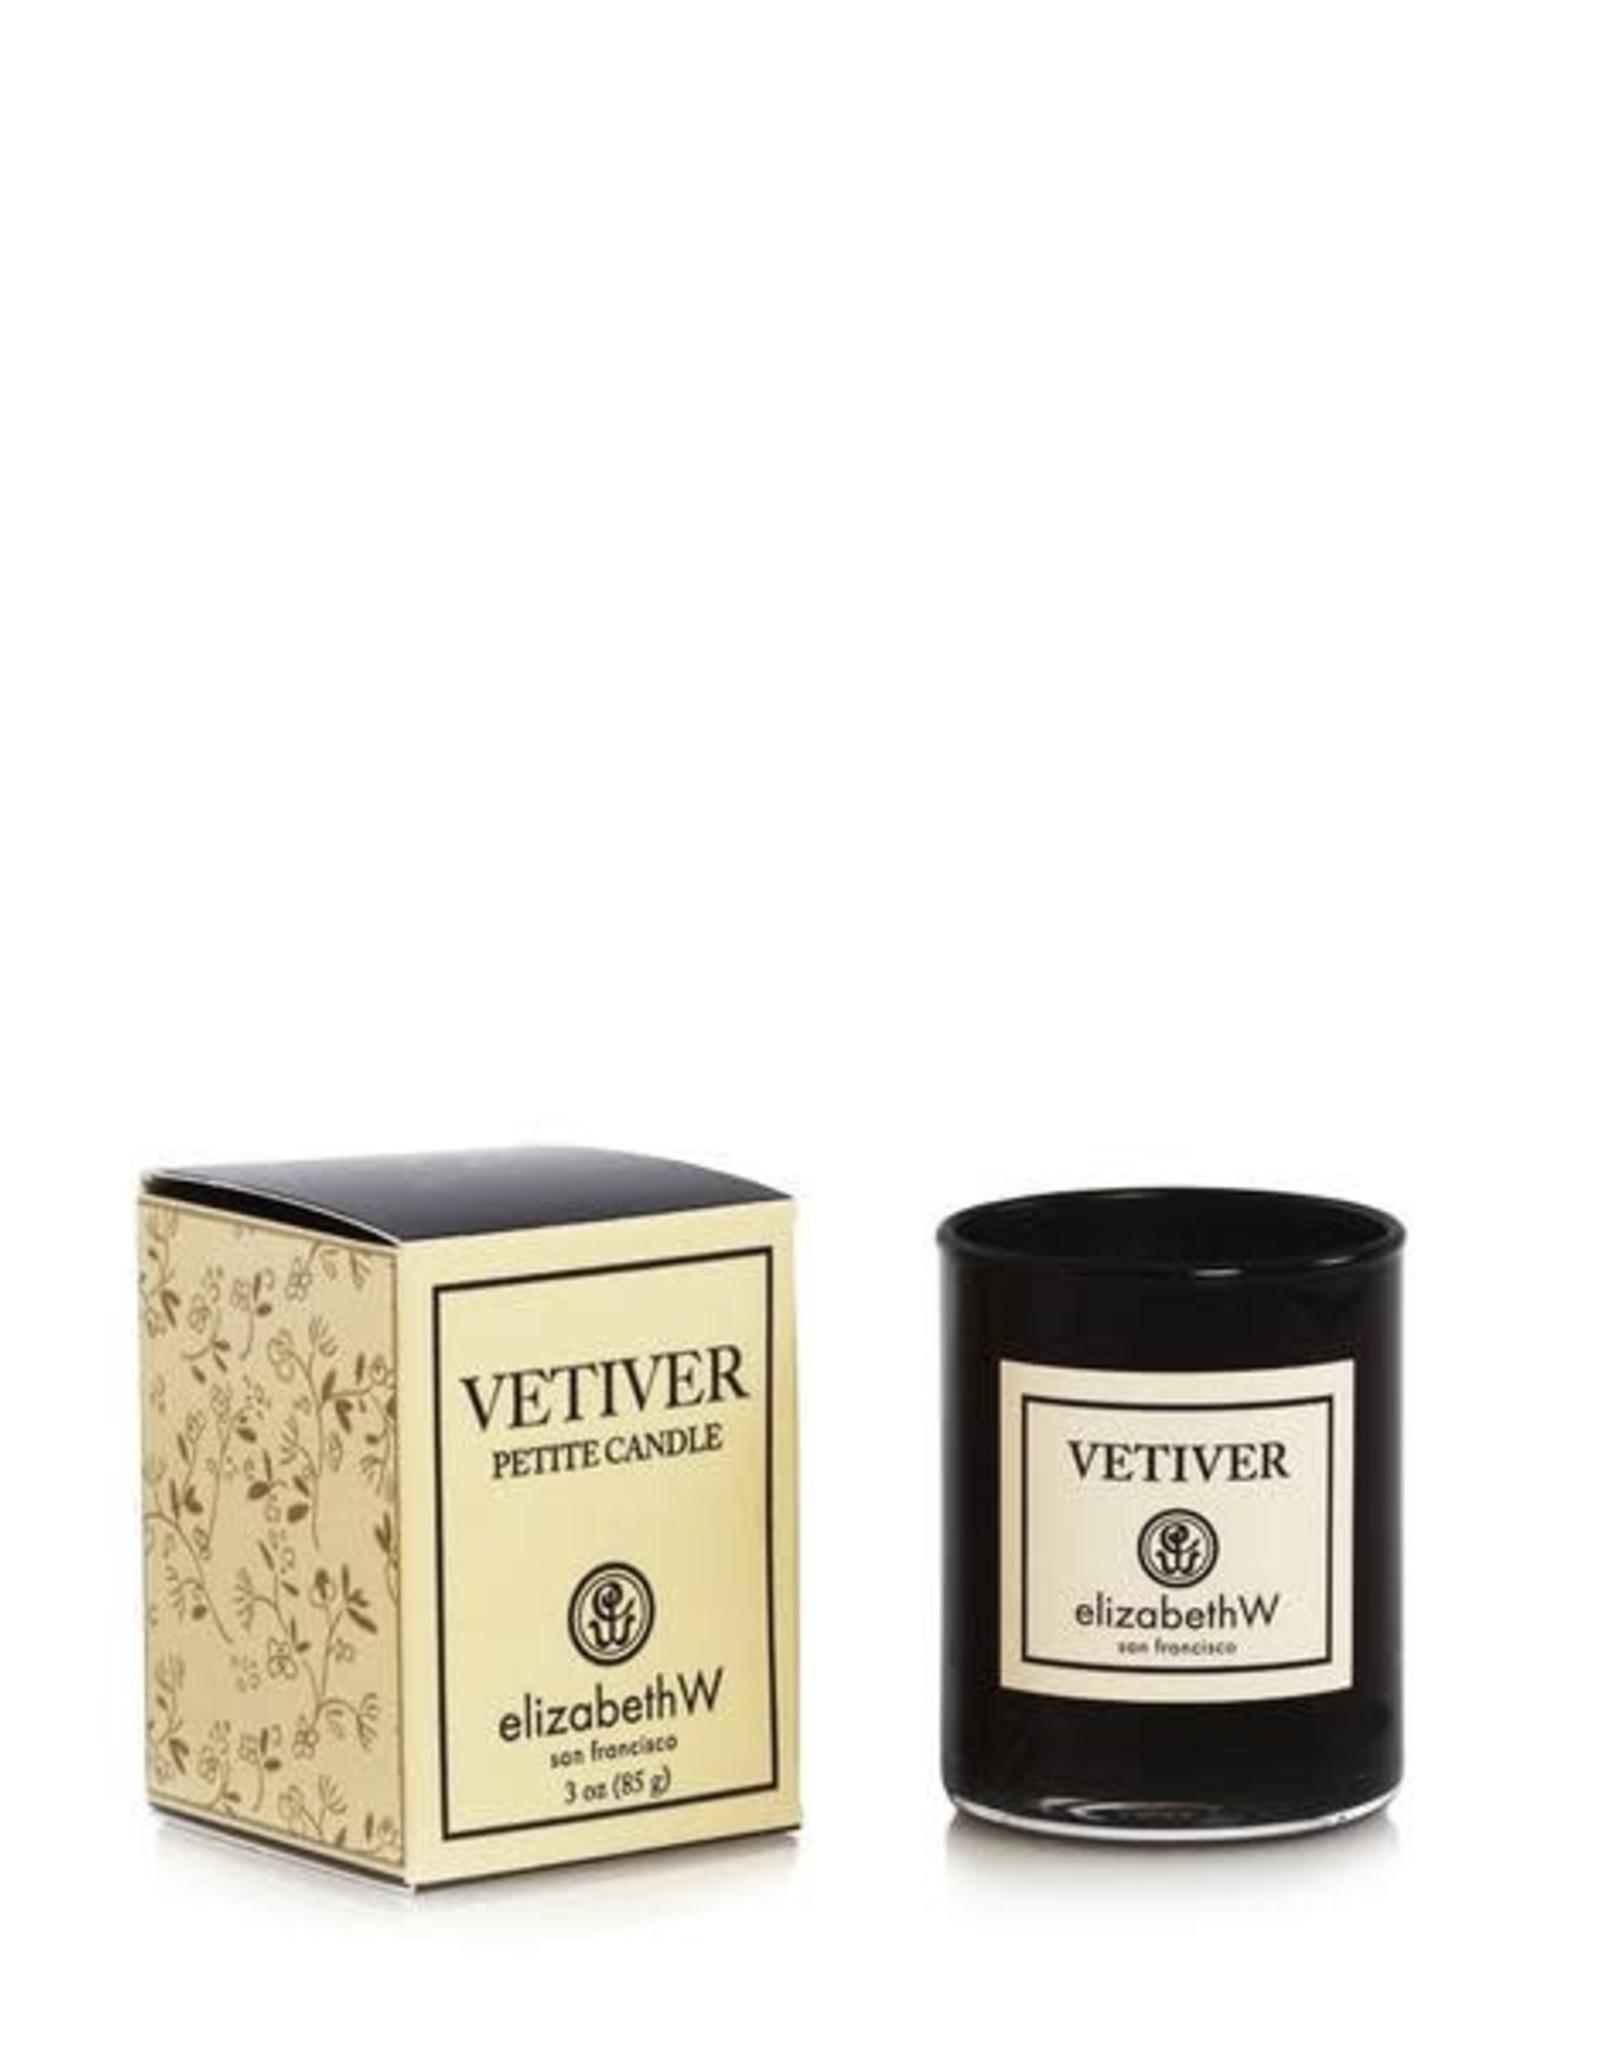 Elizabeth W. Vetiver Candle, 3 oz